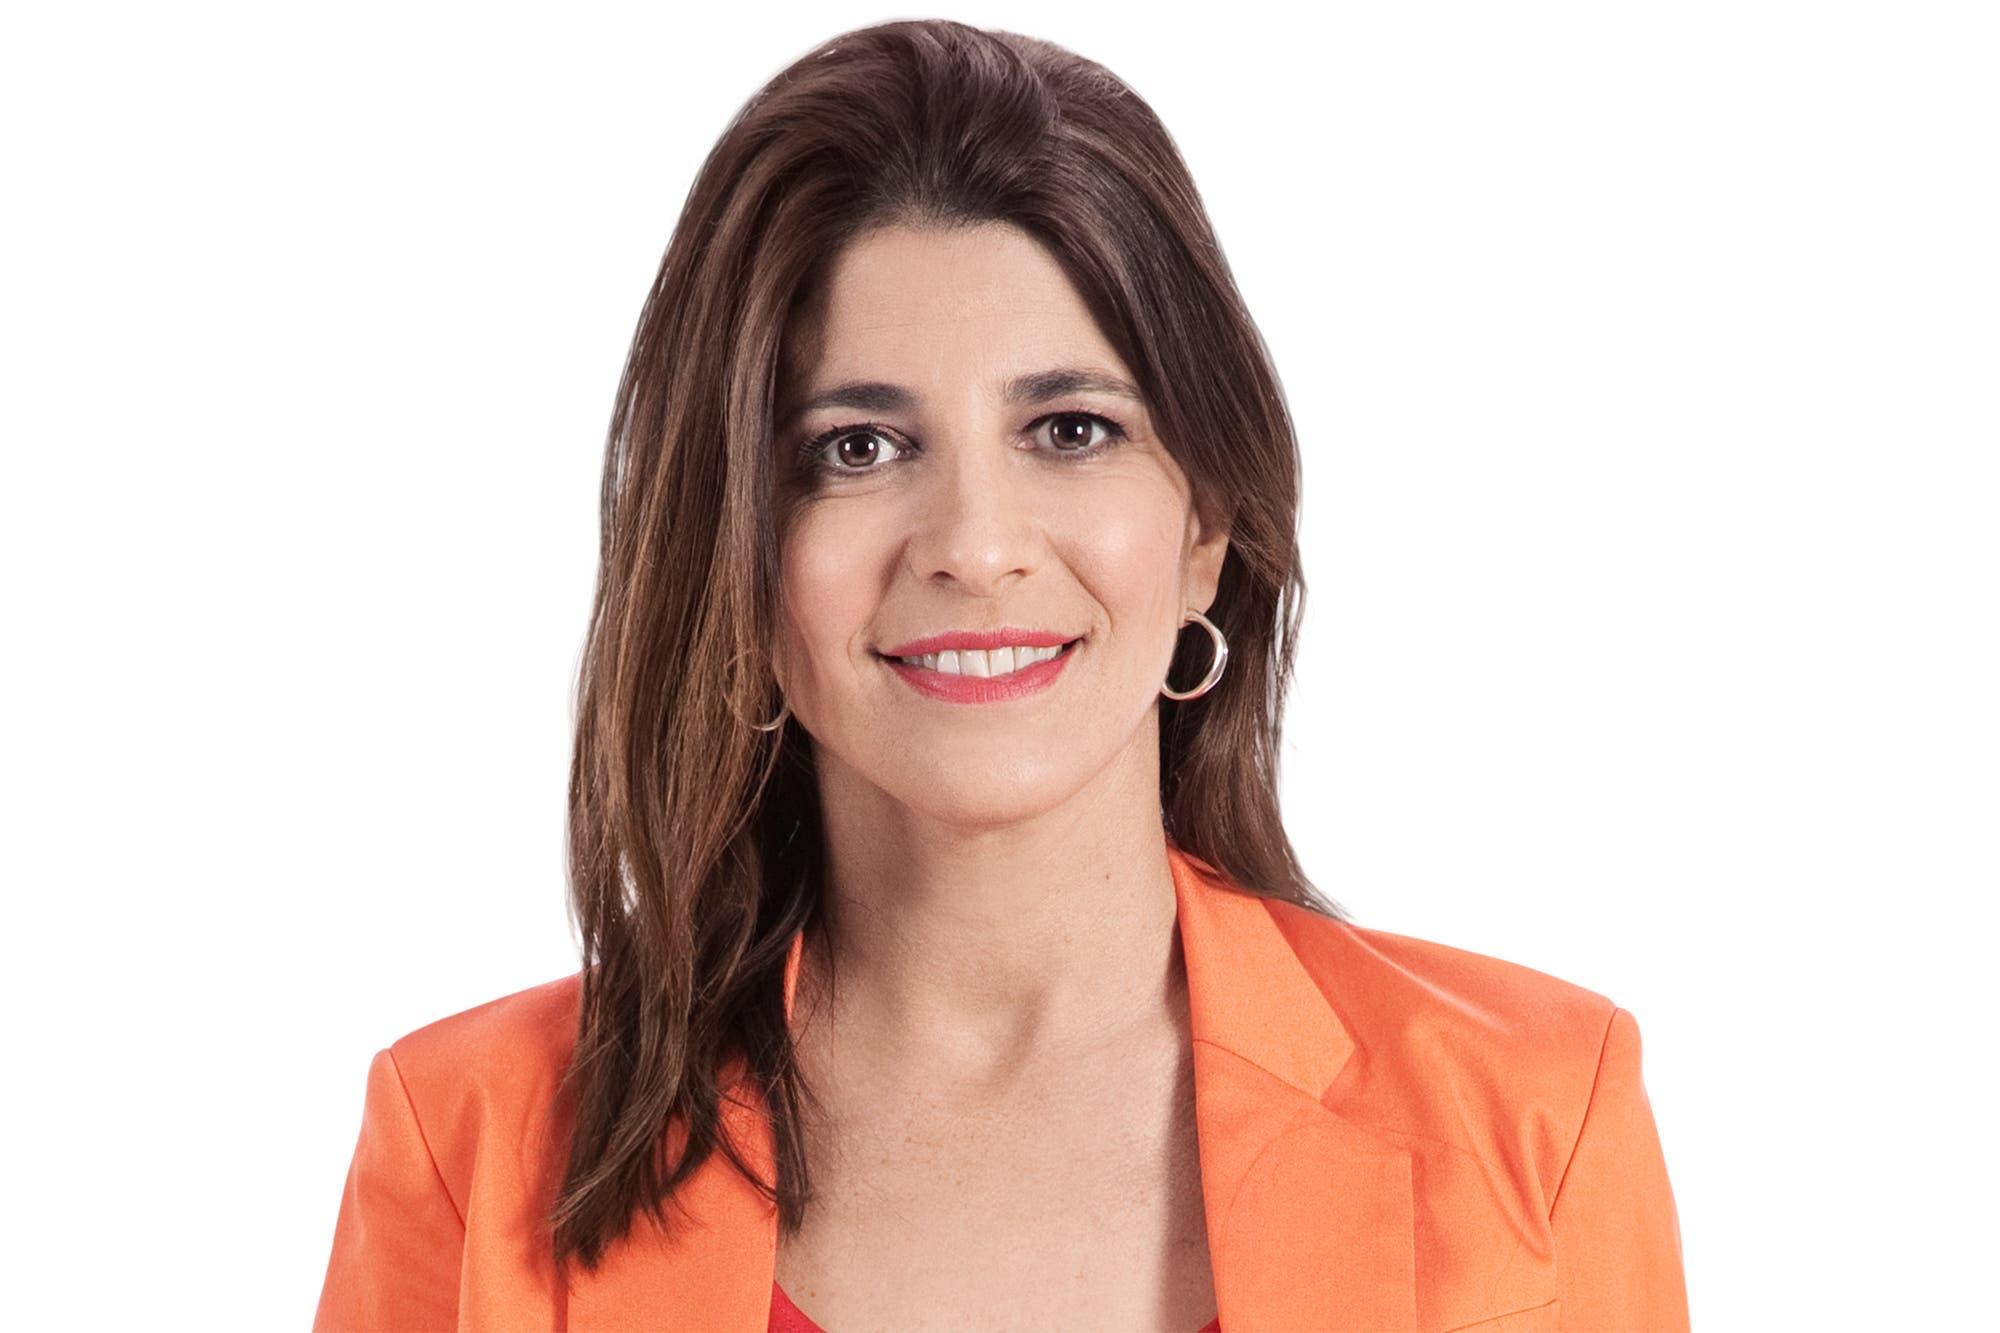 Fernando Carnota se suma a LN+ y Eleonora Cole regresa a sus programas